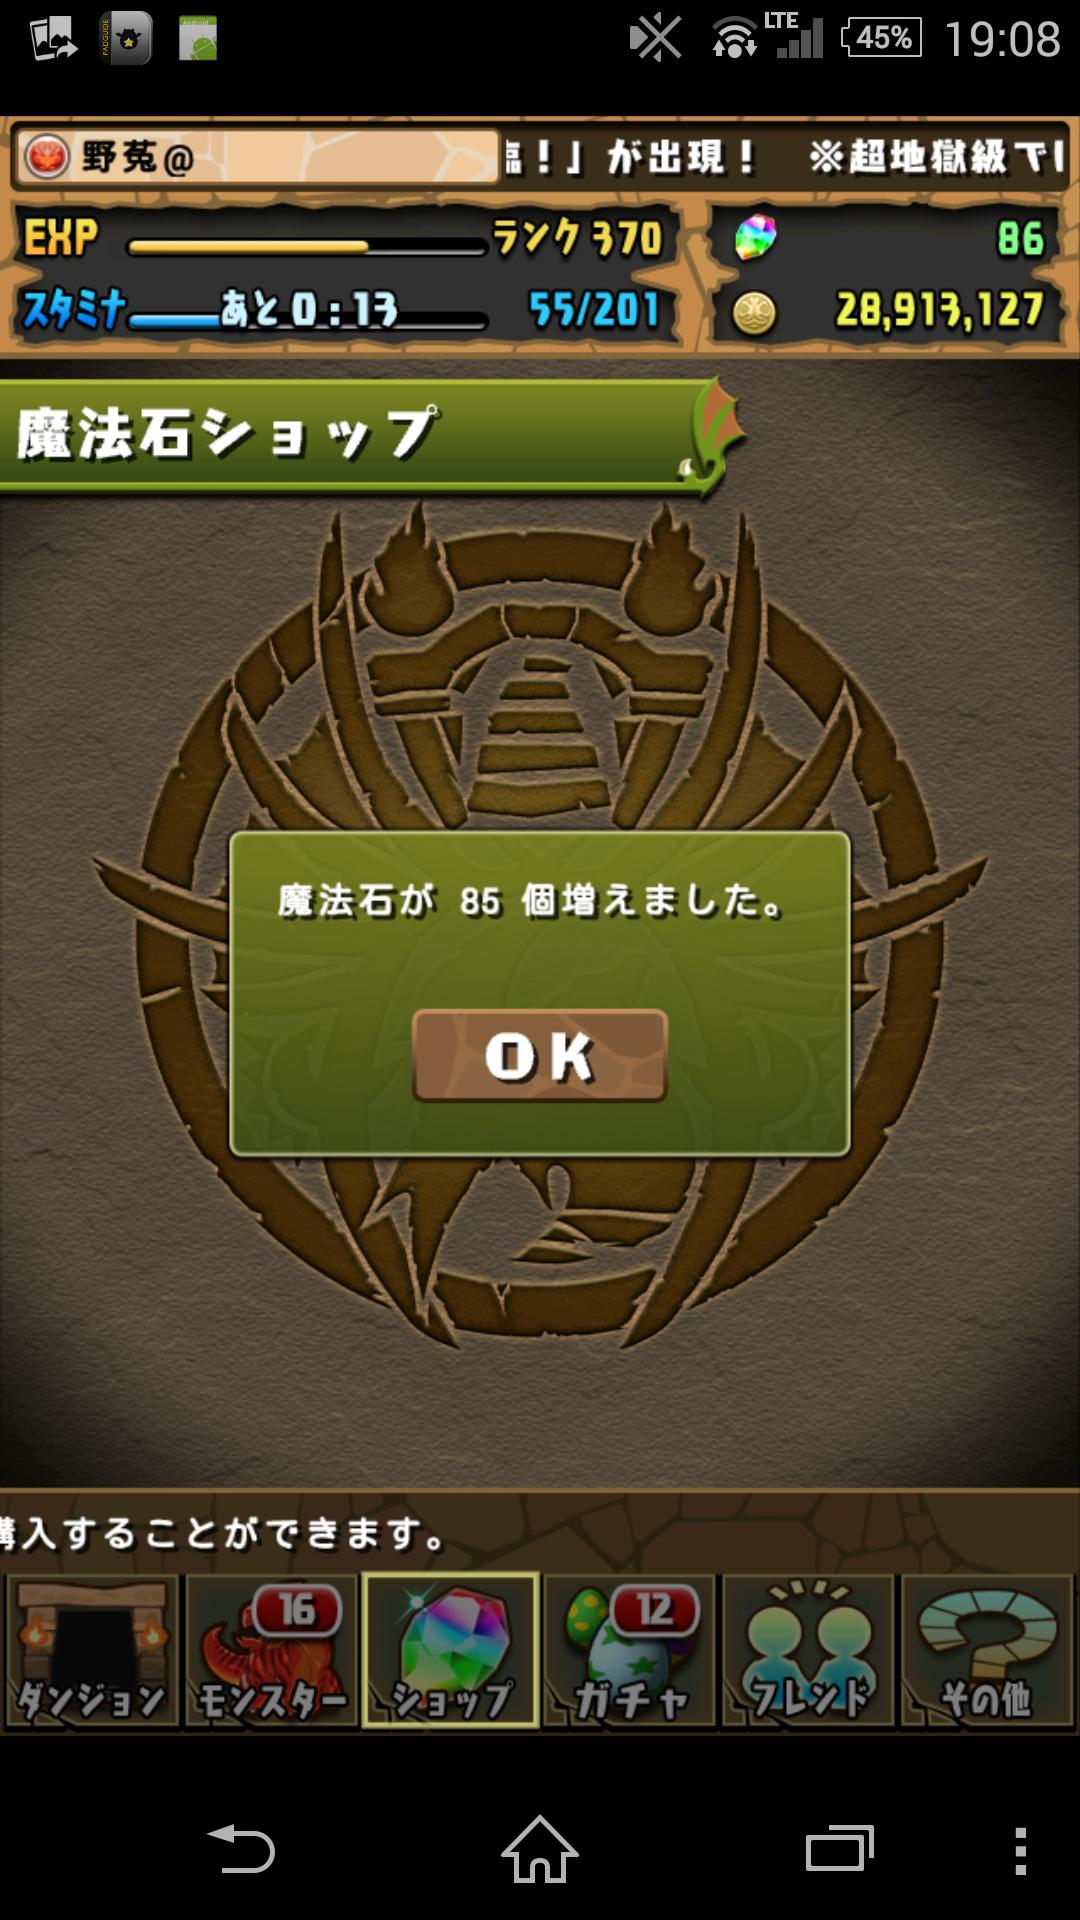 Screenshot_2014-10-01-19-08-45.png